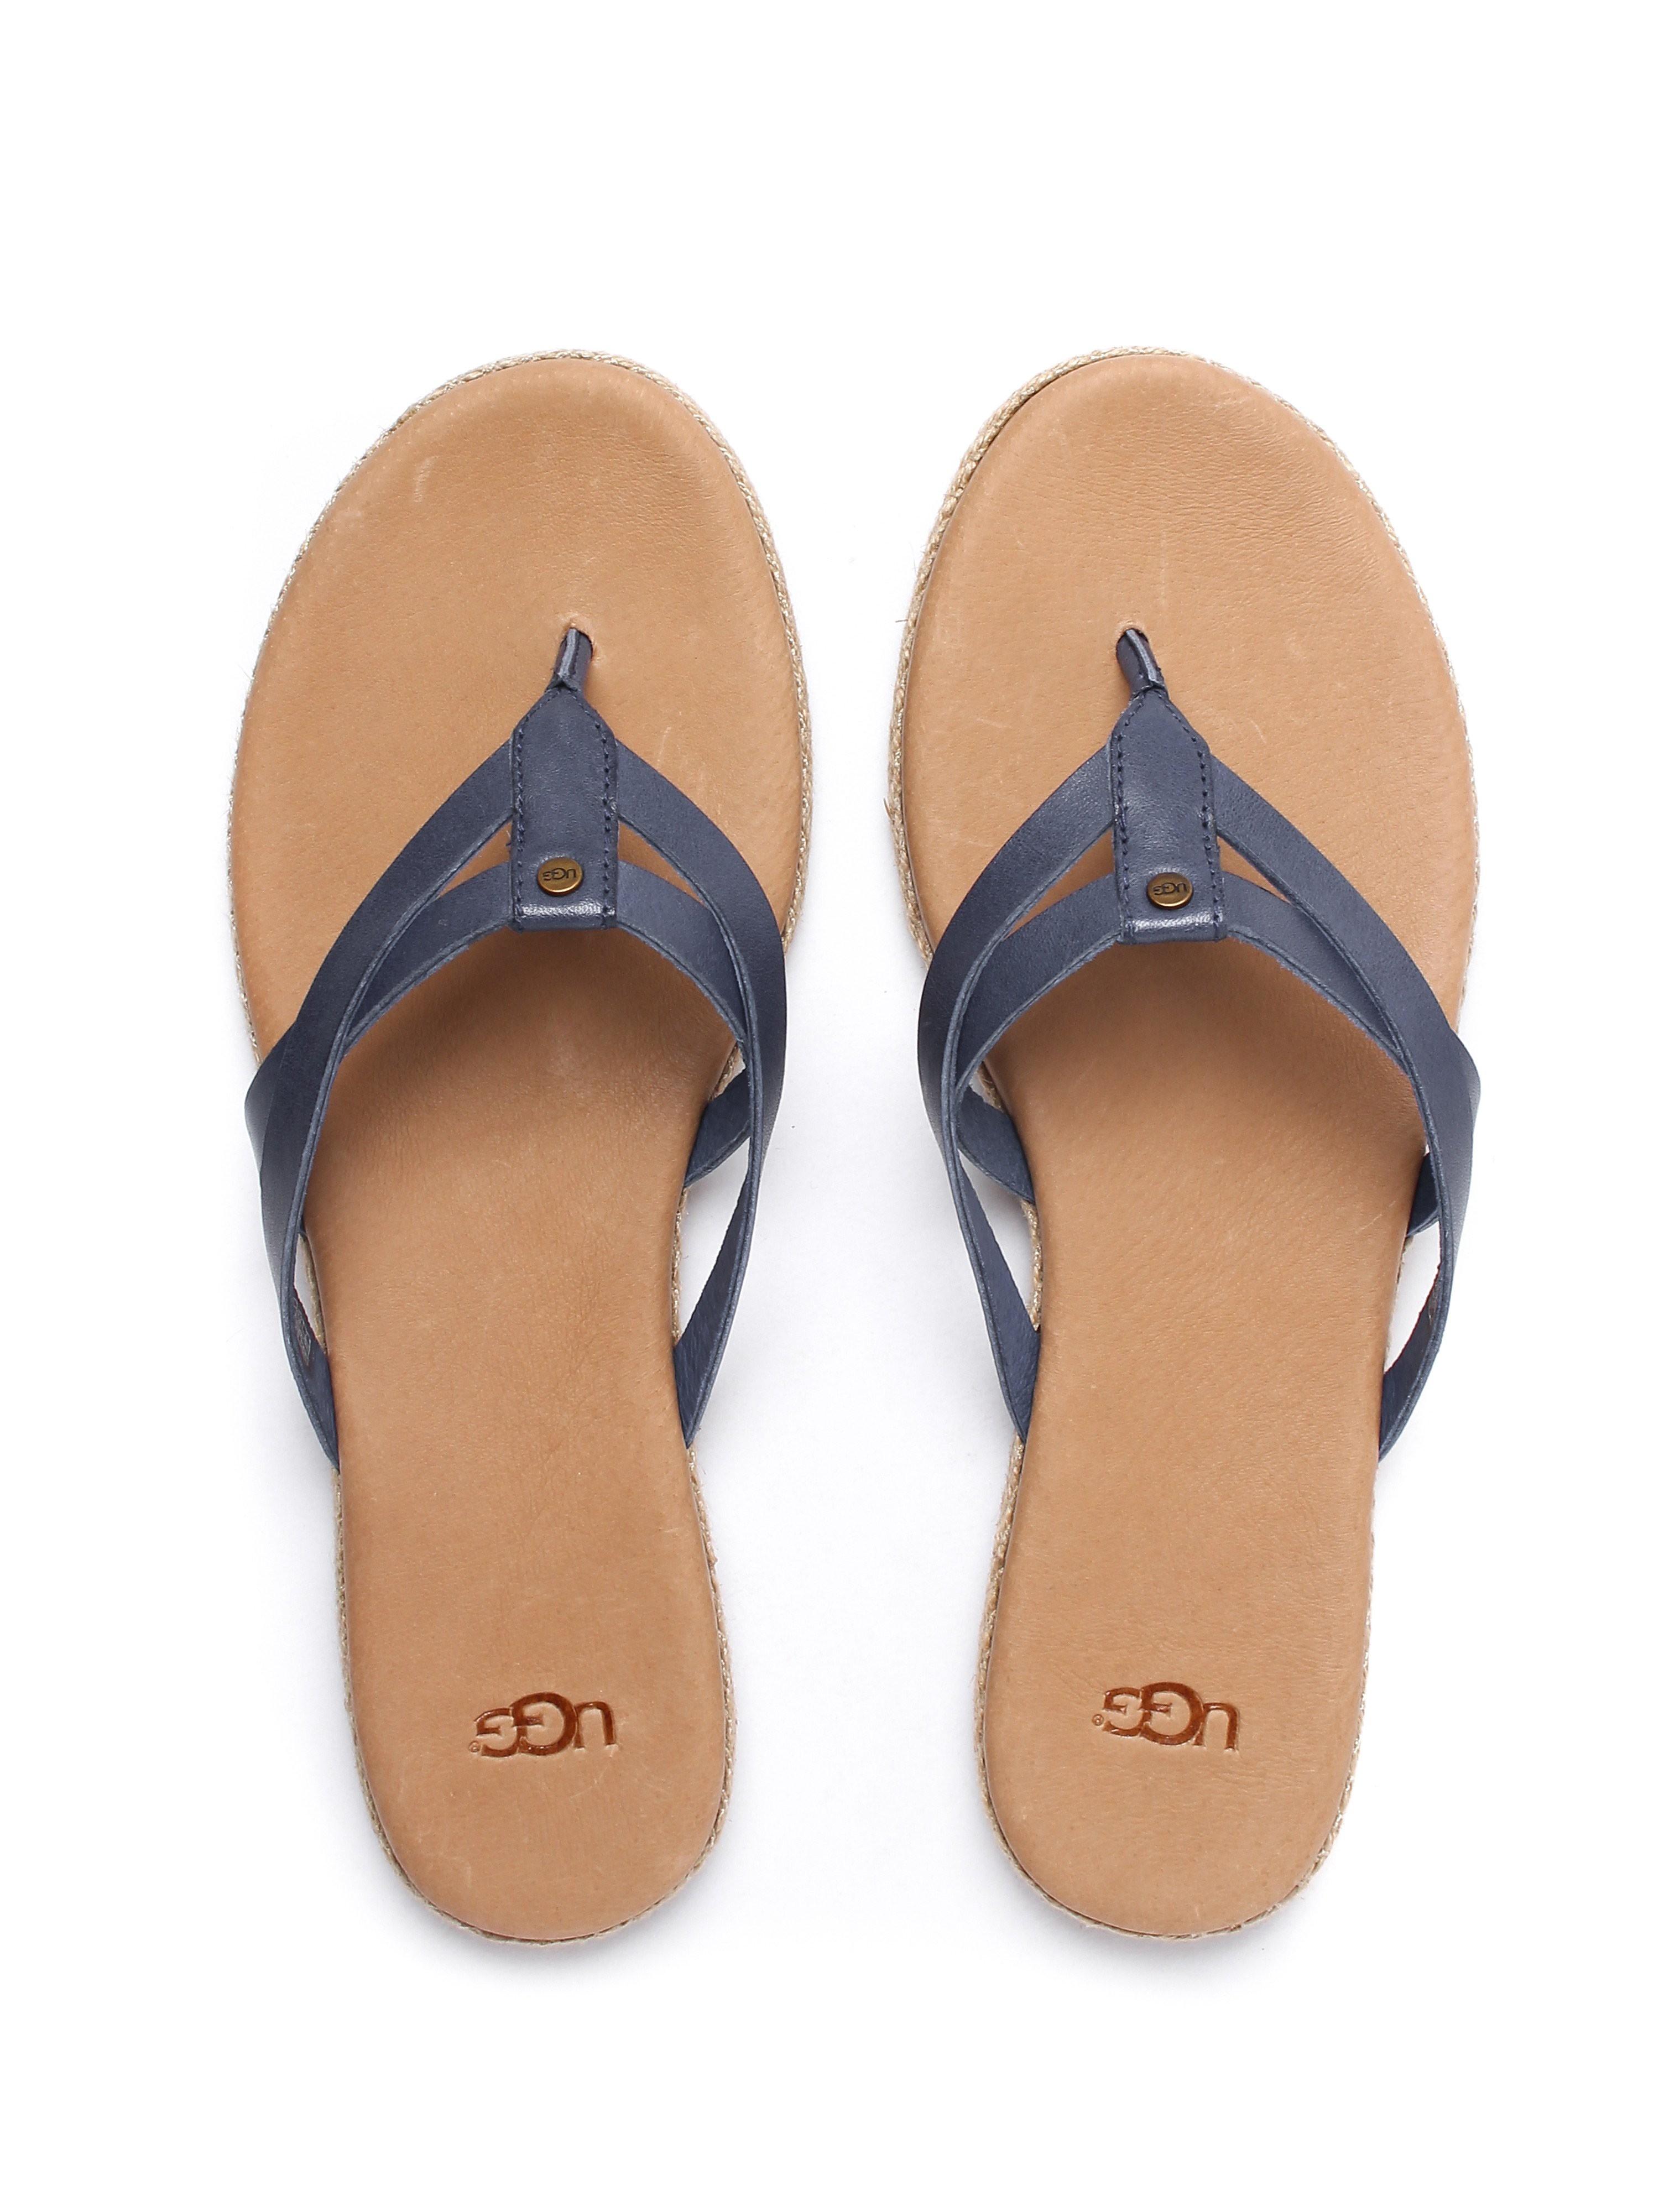 Ugg Women's Annice Leather Flip Flops - Marino